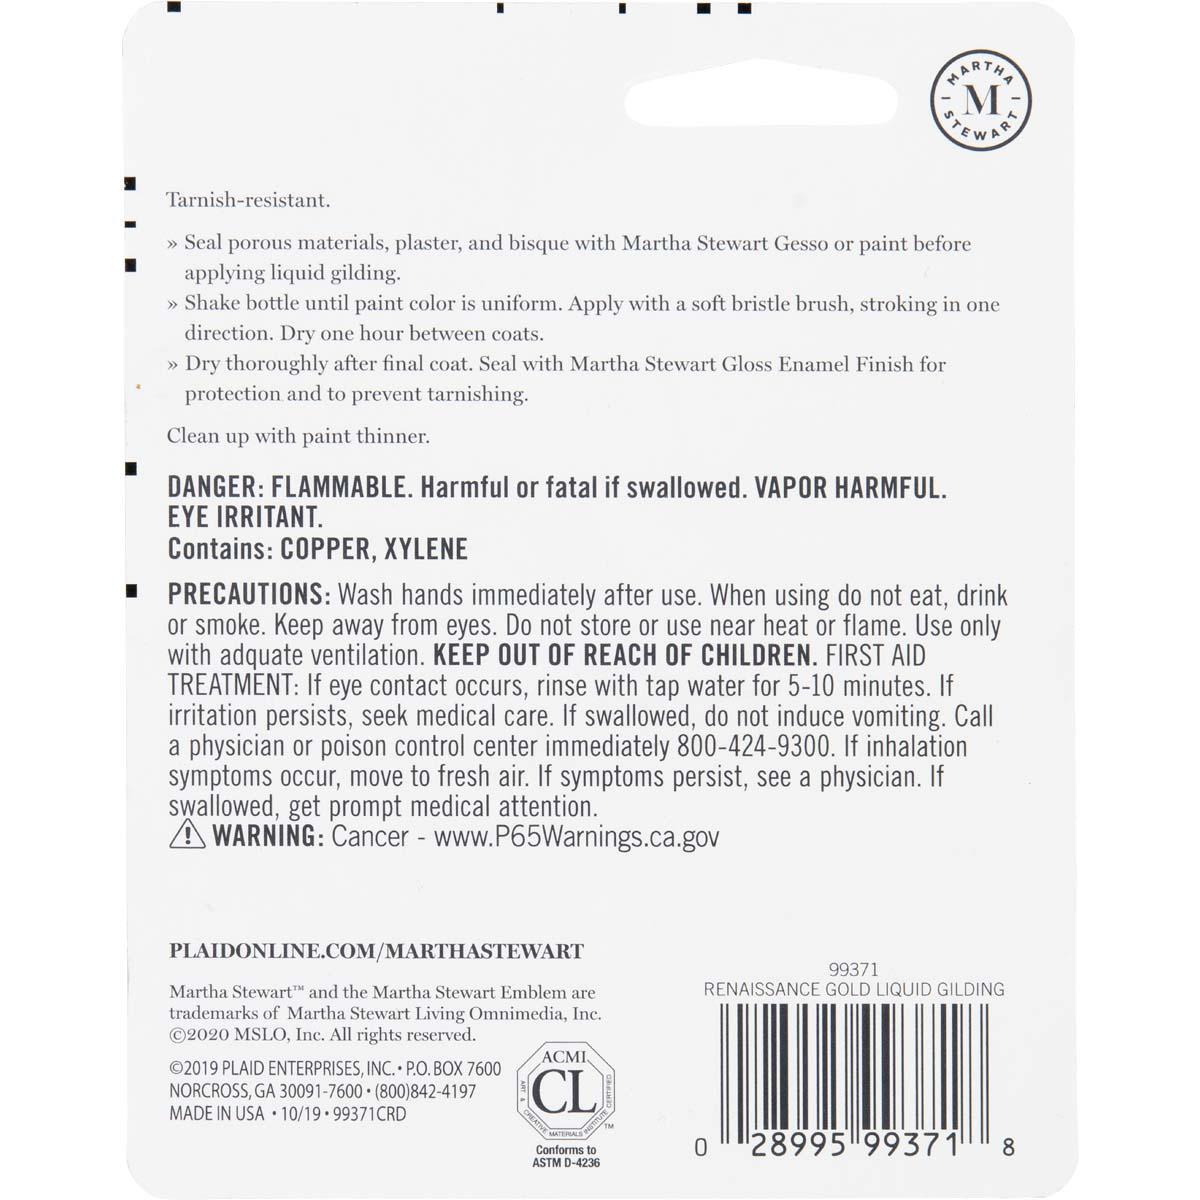 Martha Stewart ® Liquid Gilding, 3/4 oz. Renaissance Gold - 99371